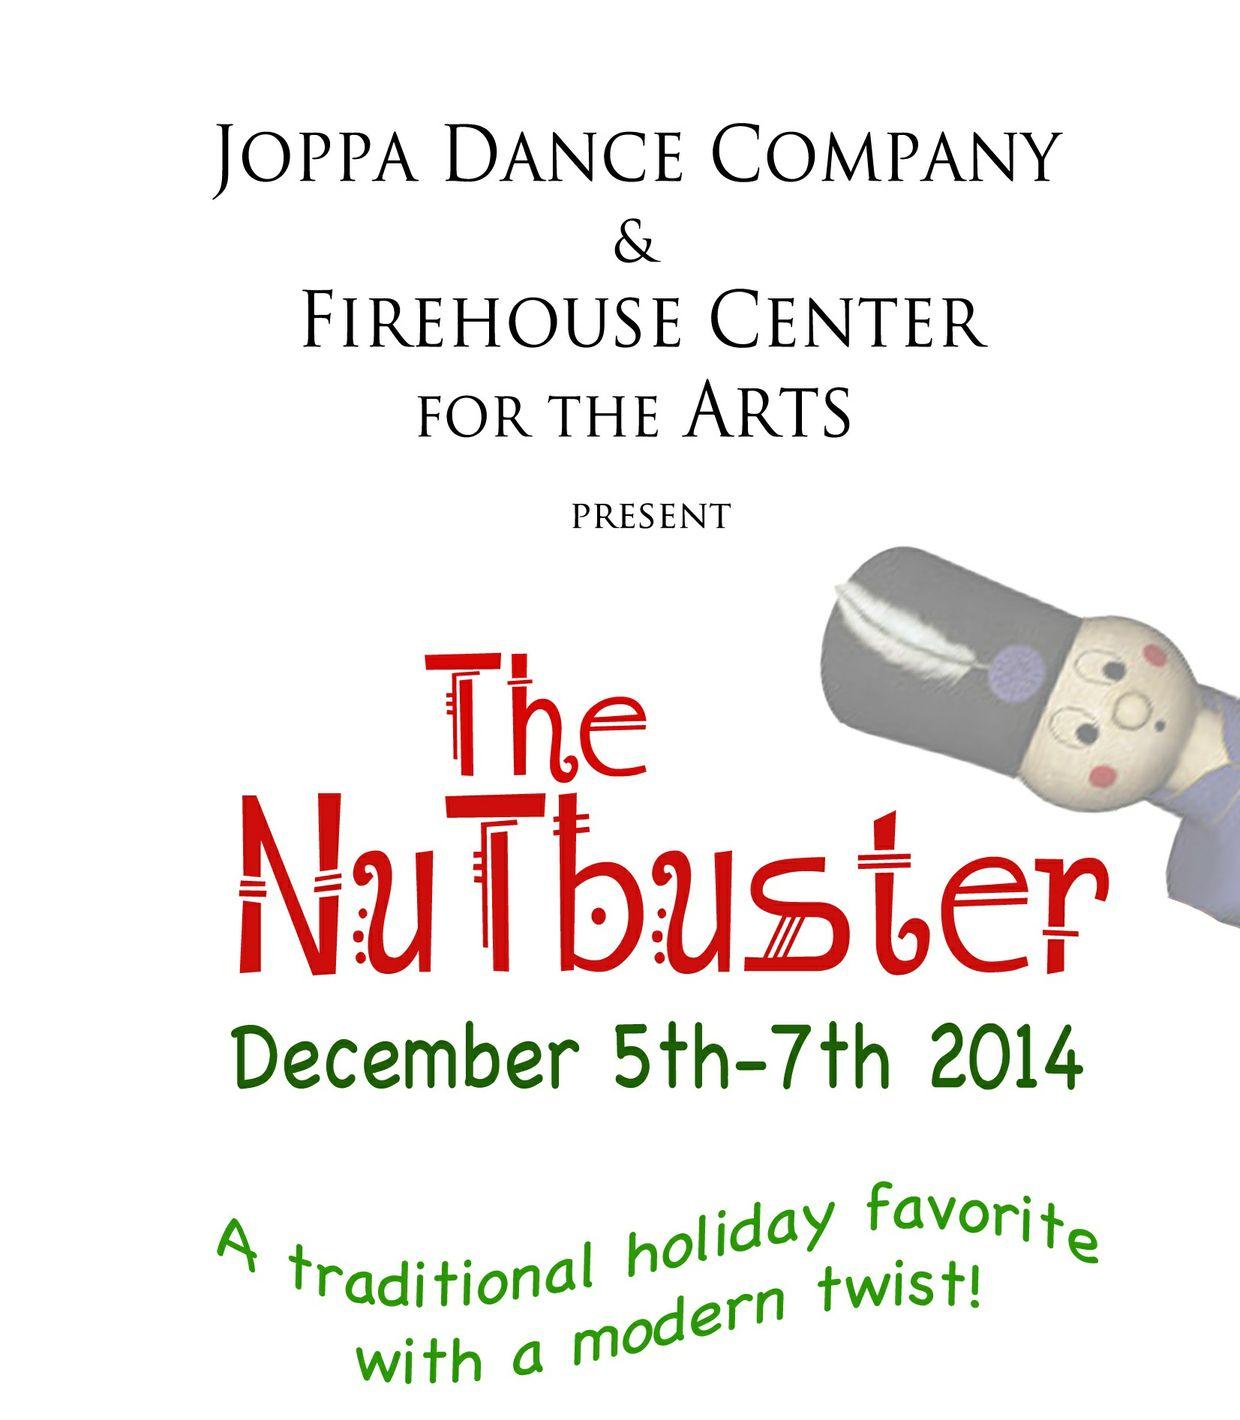 Joppa - Nutbuster 2014